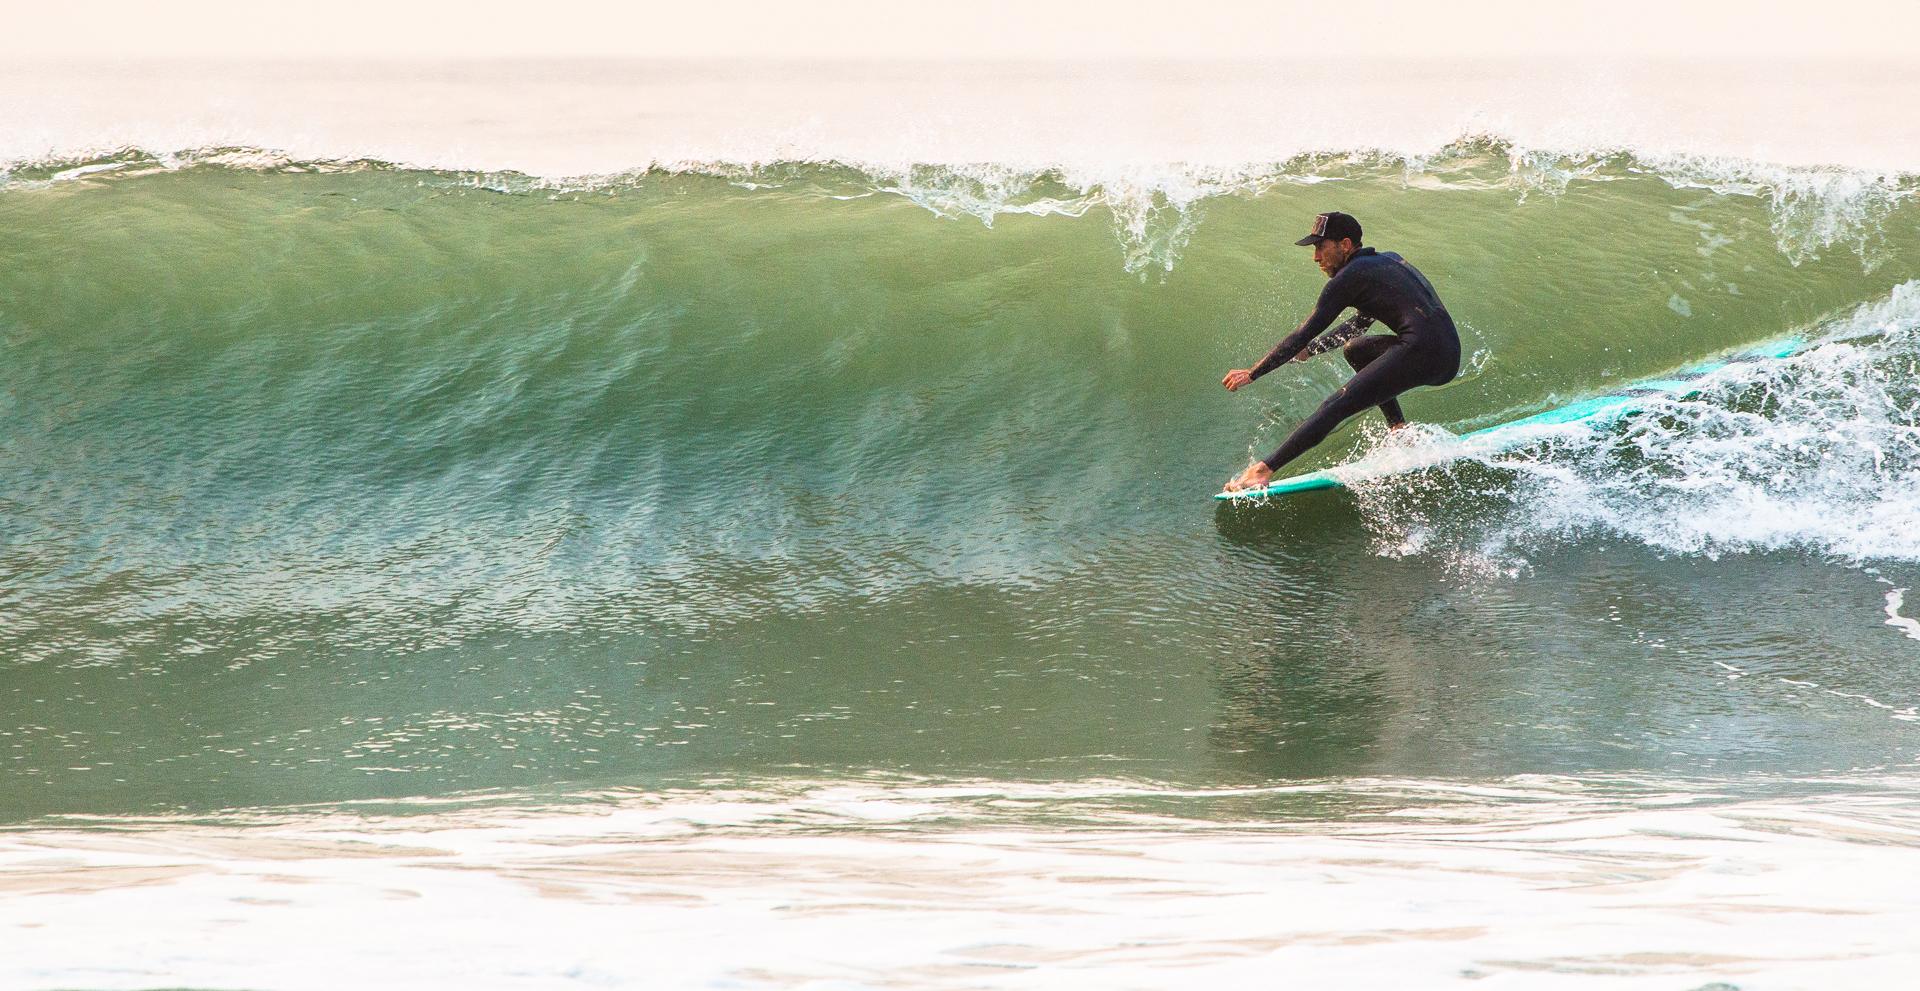 swb_surfing_002